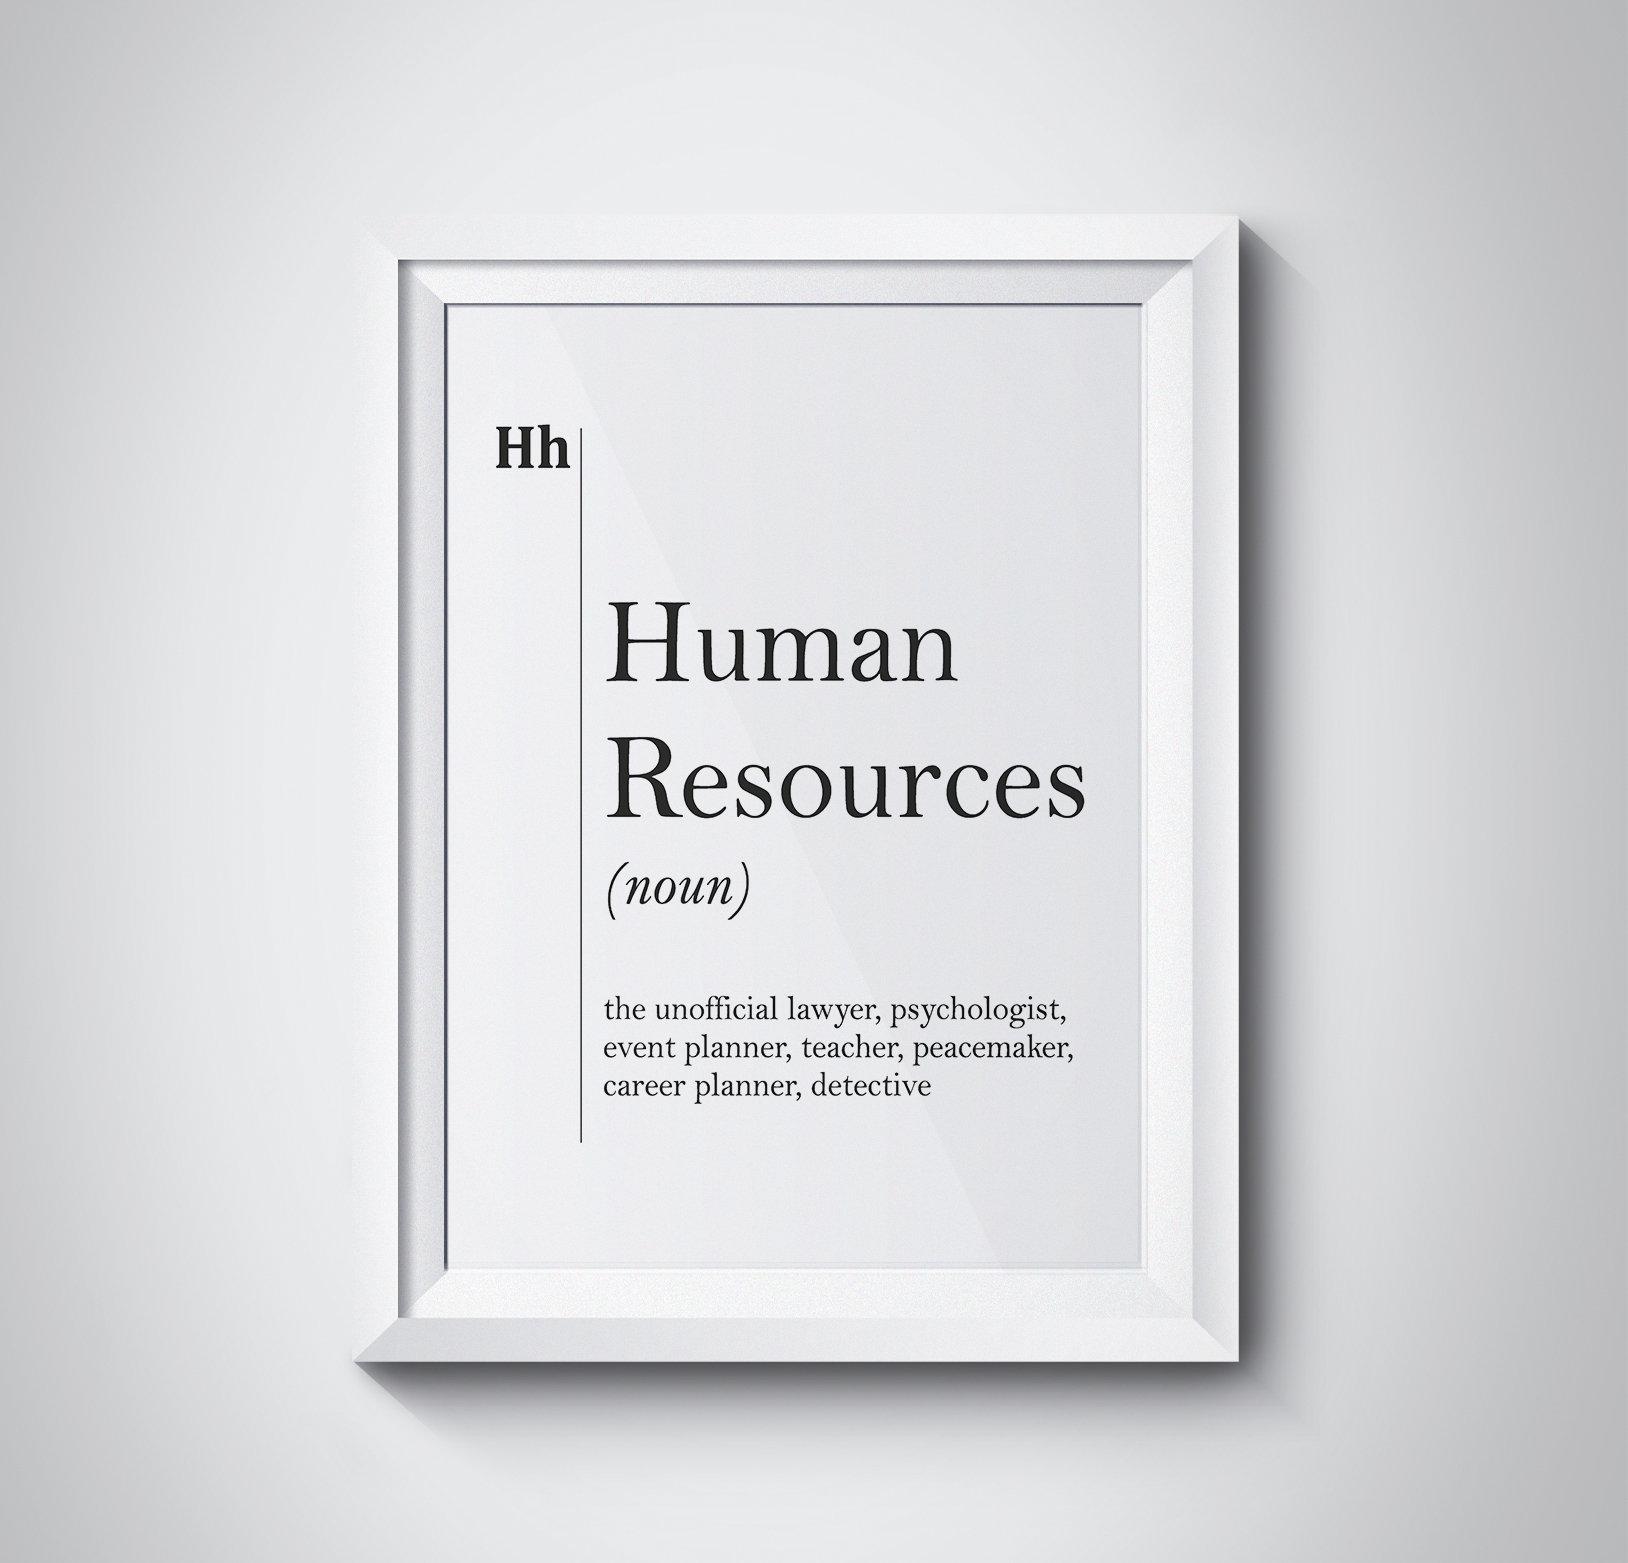 human resources definition print hr office decor recruiter | etsy